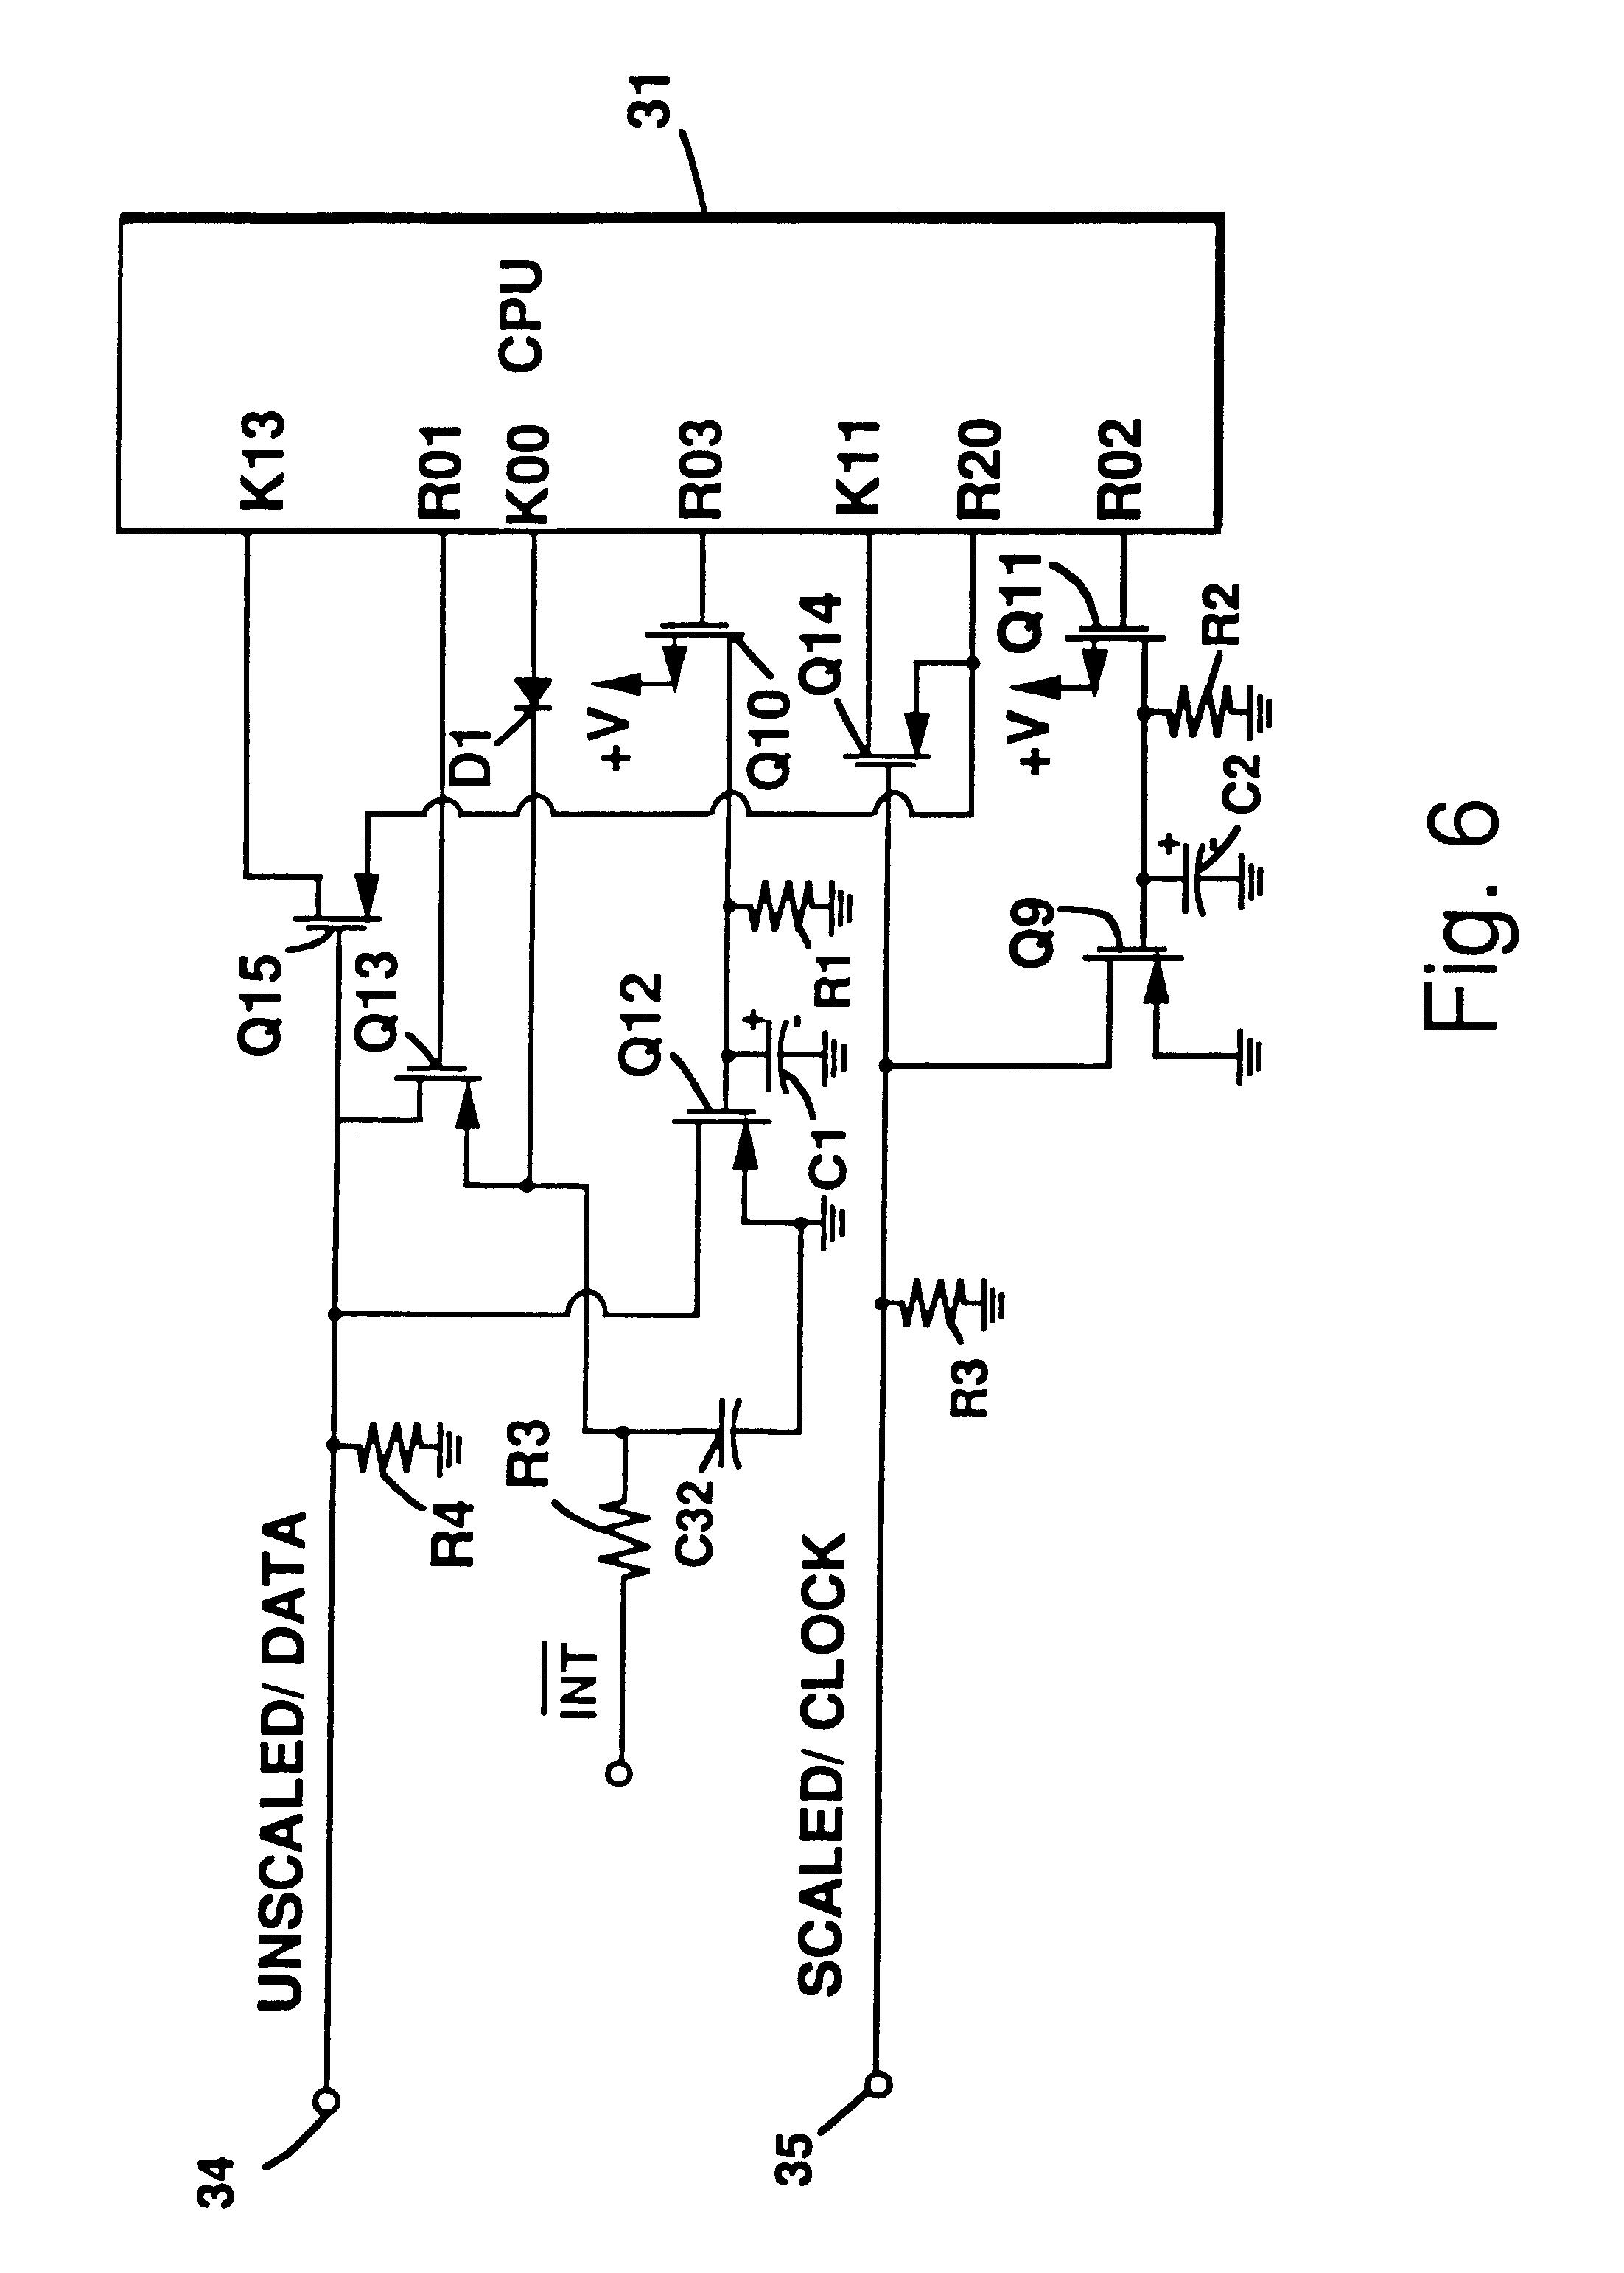 Badger Water Meter Wiring Diagram 33 Wiring Diagram